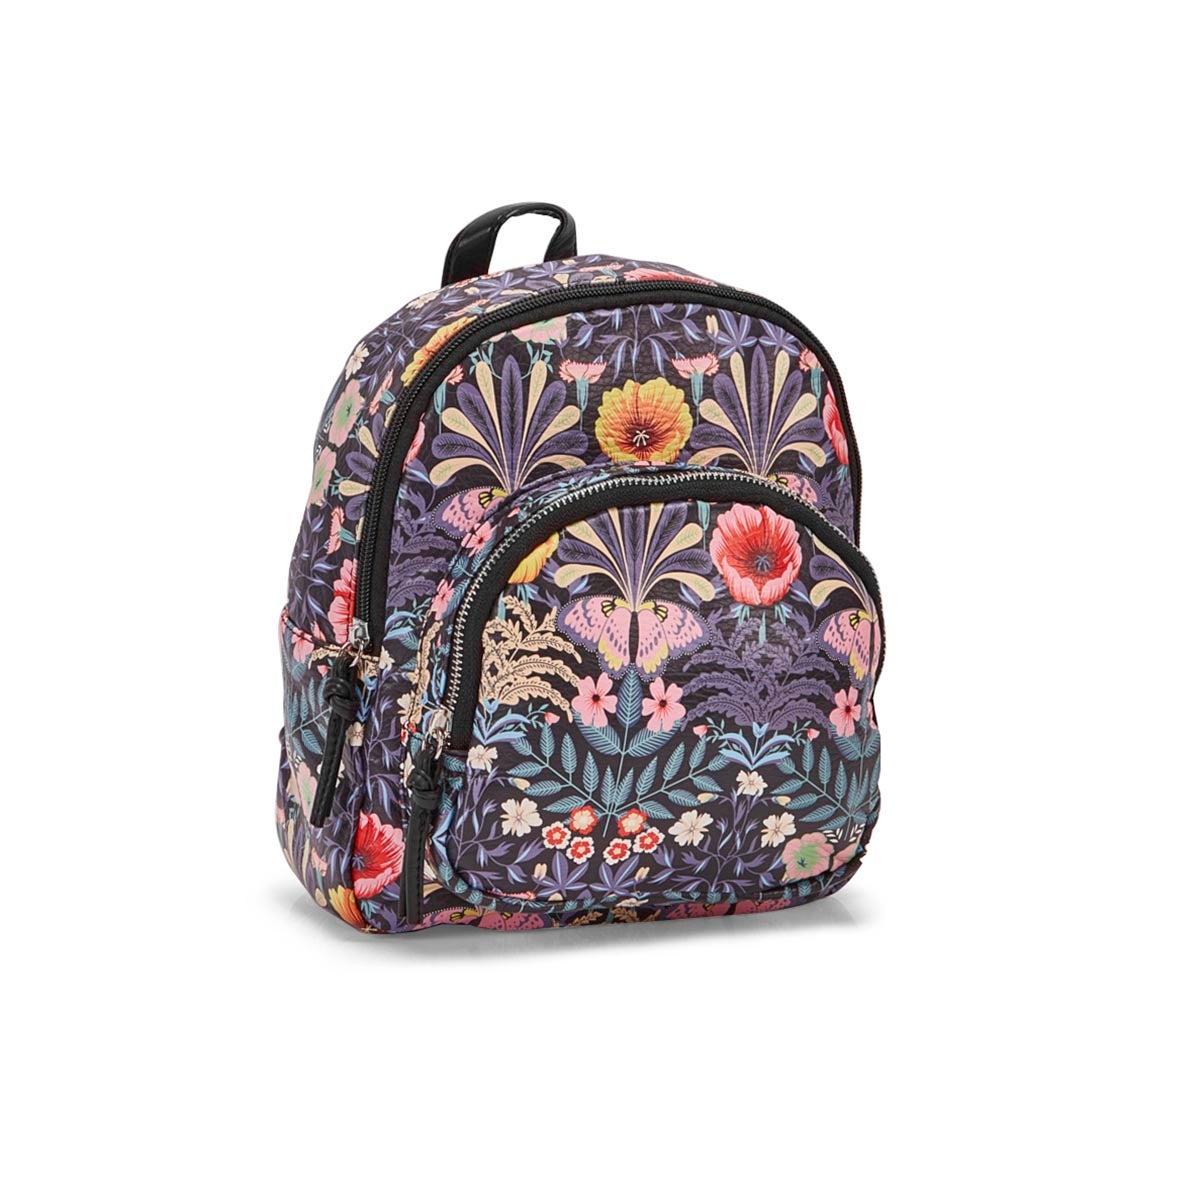 Lds blk flower/butterfly backpack